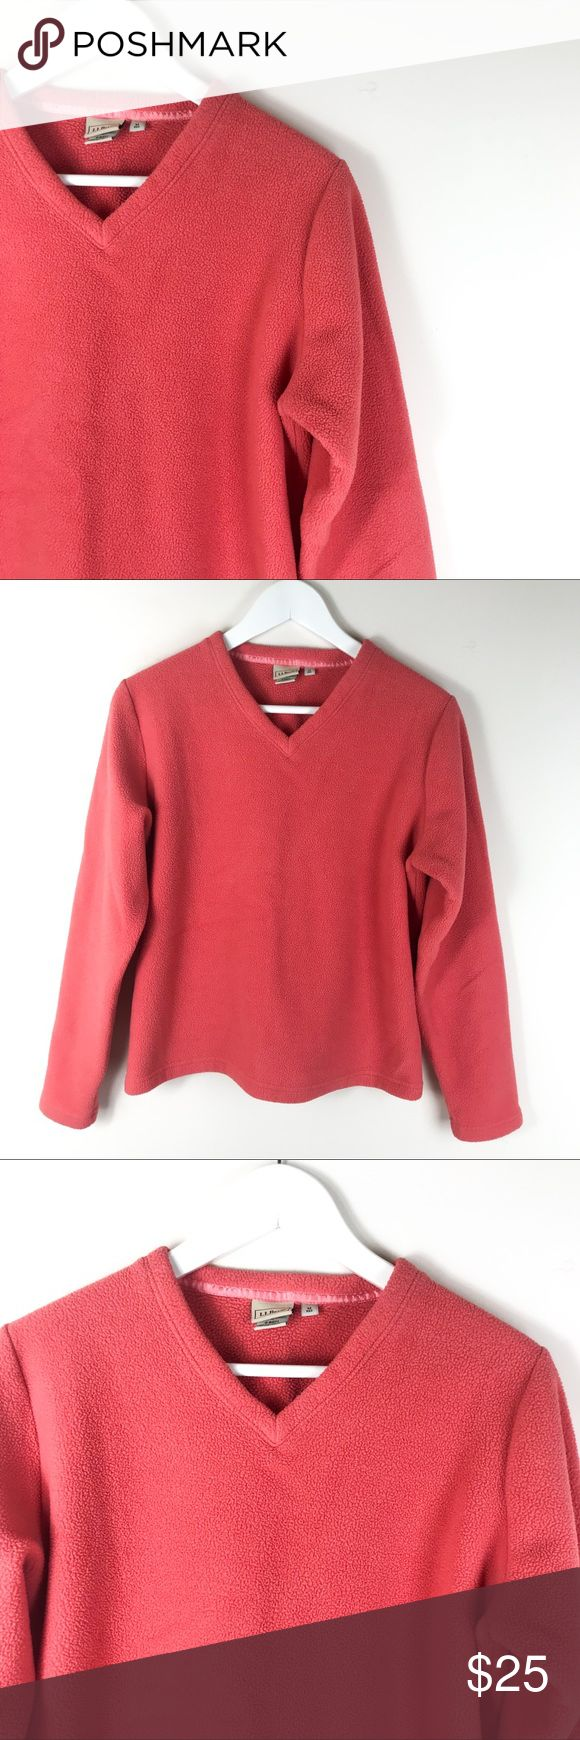 L.L. Bean Red Orange Fleece V-Neck Top Size Medium Women's L.L. Bean Red Orange Fleece V-Neck Top Size Medium  This L.L. Bean Sweatshirt is used, but in good condition overall. Size - Medium. L.L. Bean Sweaters V-Necks